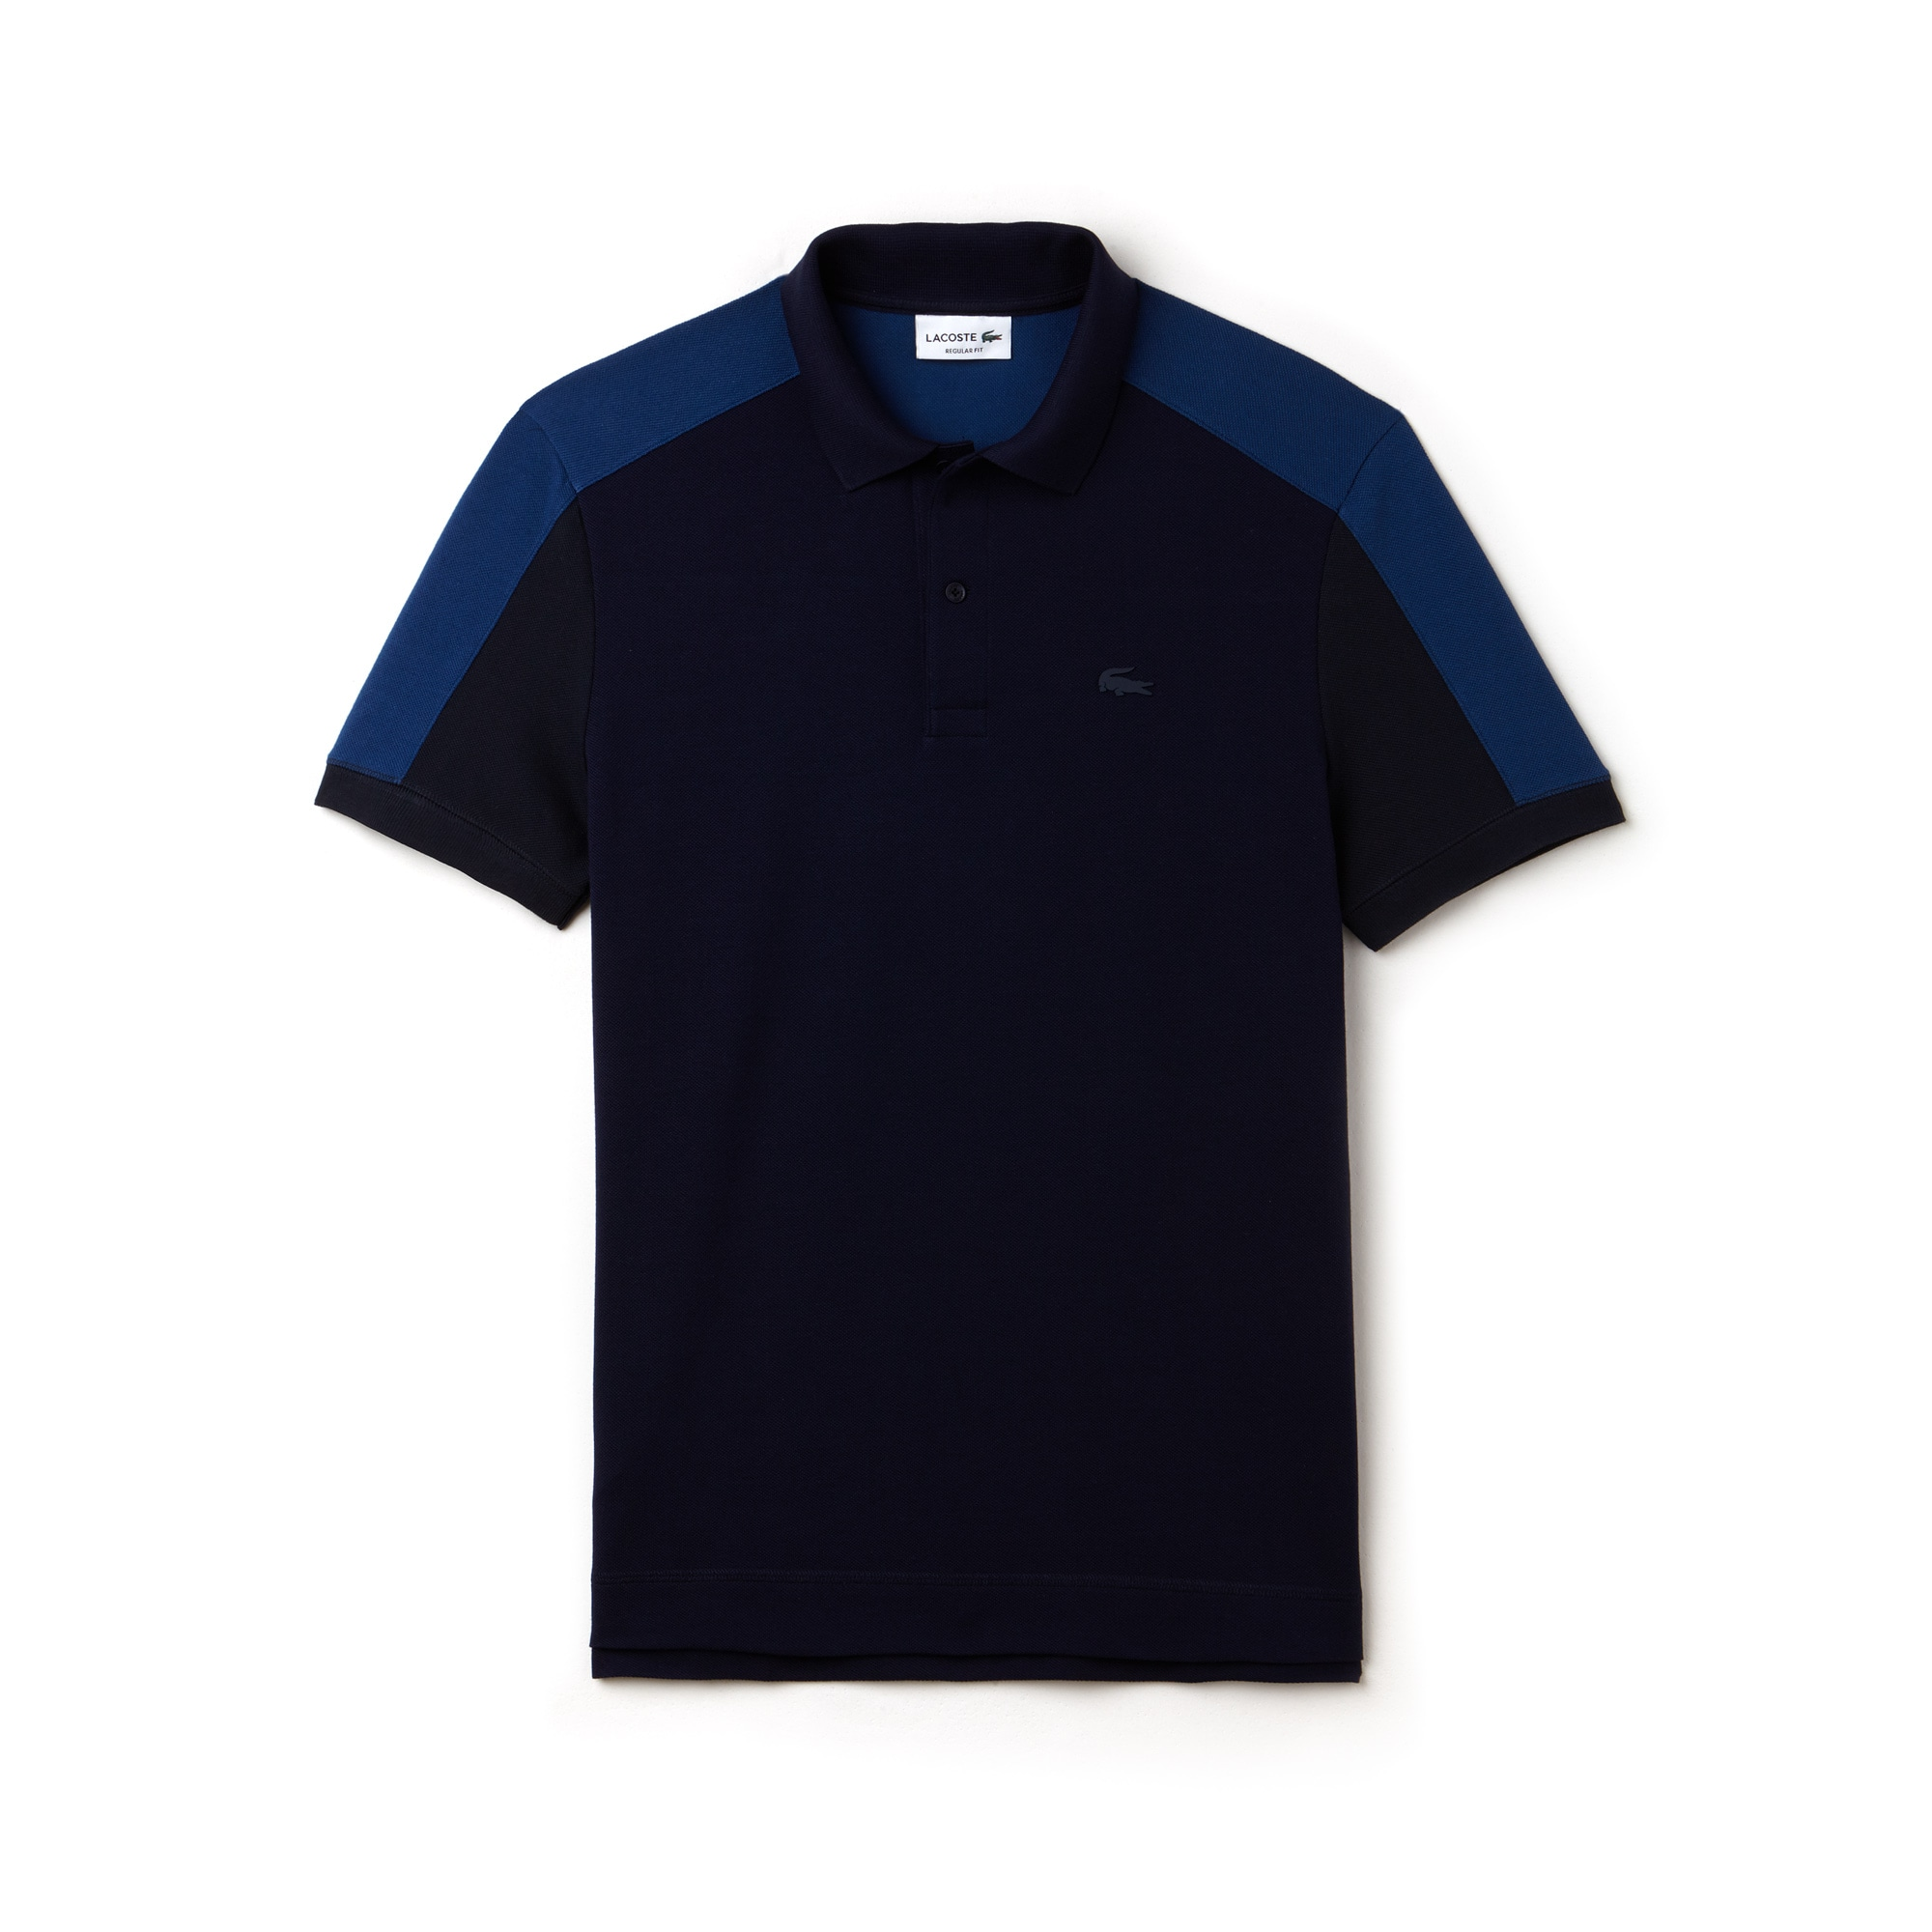 Polo regular fit Lacoste in petit piqué color block